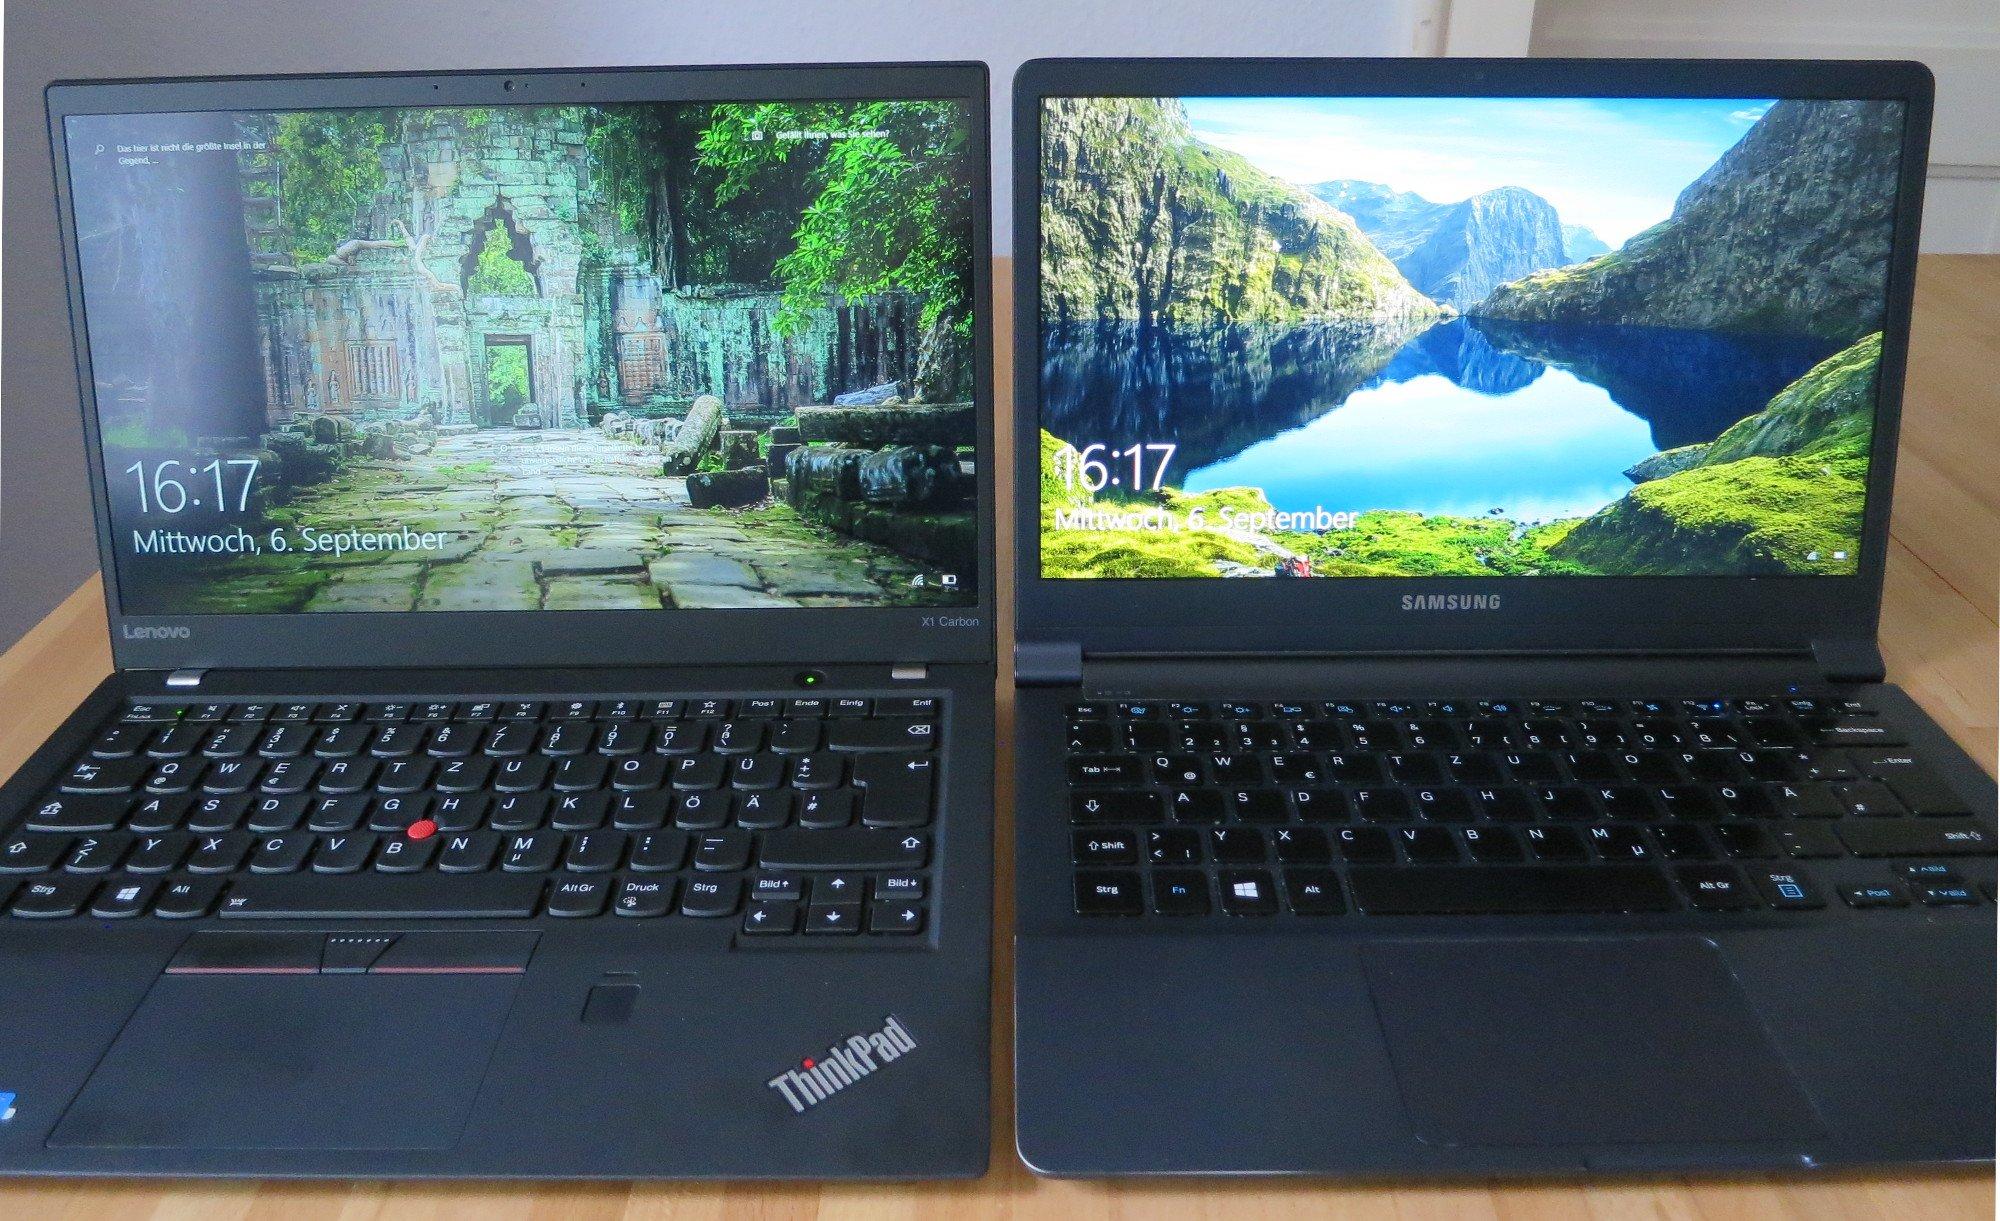 Lenovo Thinkpad X1 Carbon (links) und Samsung Ativ Book 9: Fast gleich groß, doch links mit 14-Zoll-Display, rechts bloß 13,3 Zoll (Bild: Peter Giesecke)